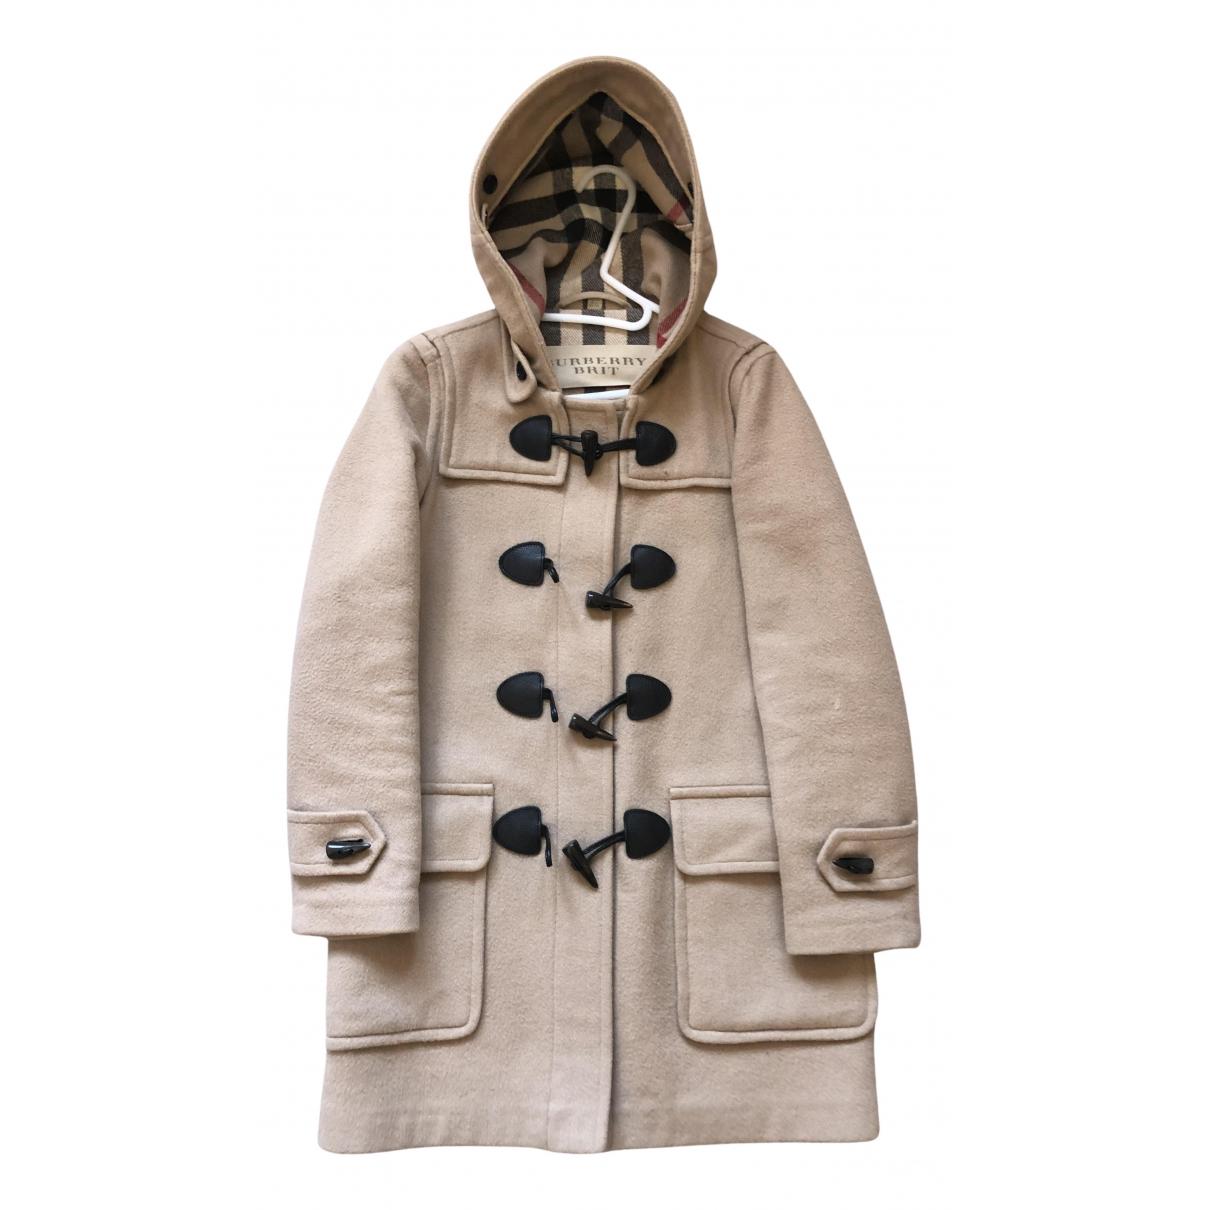 Burberry \N Maentel in  Beige Wolle